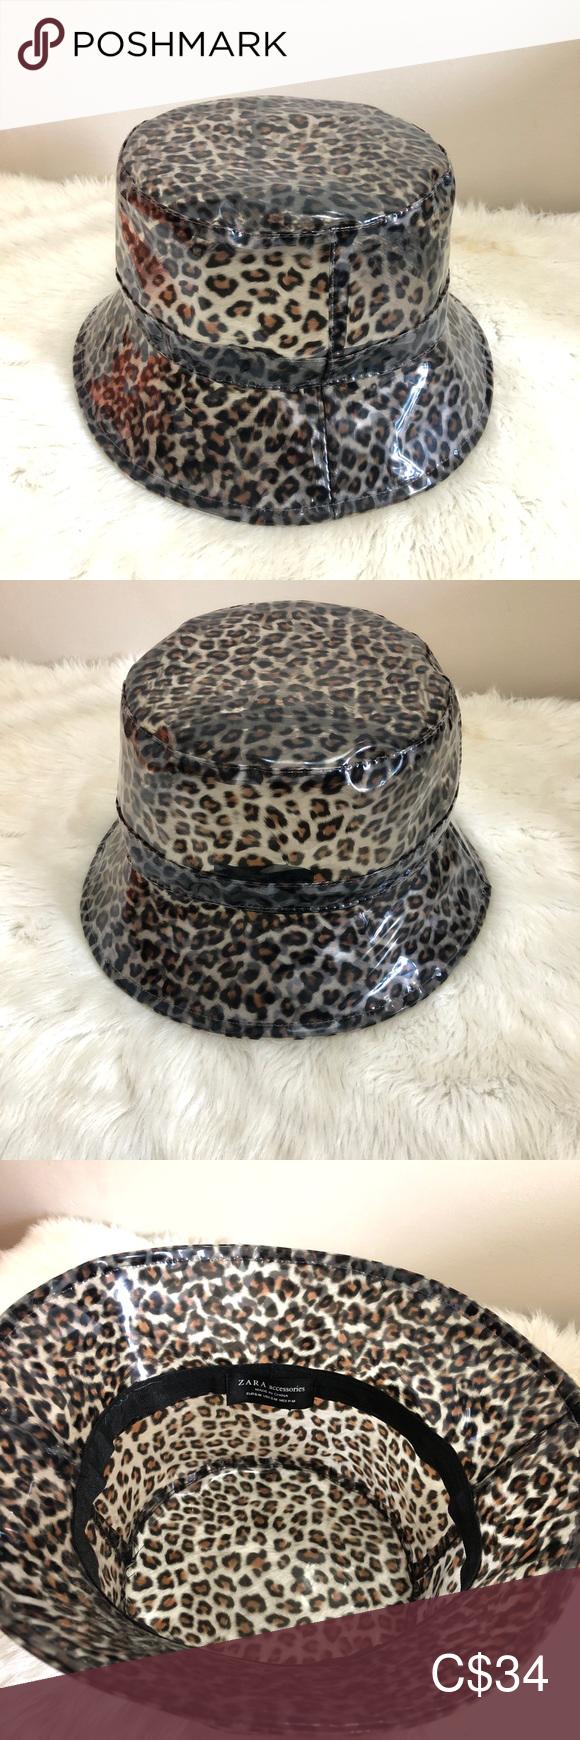 Zara Leopard Pvc Rain Hat Sheer Rain Hat Zara Sheer Material